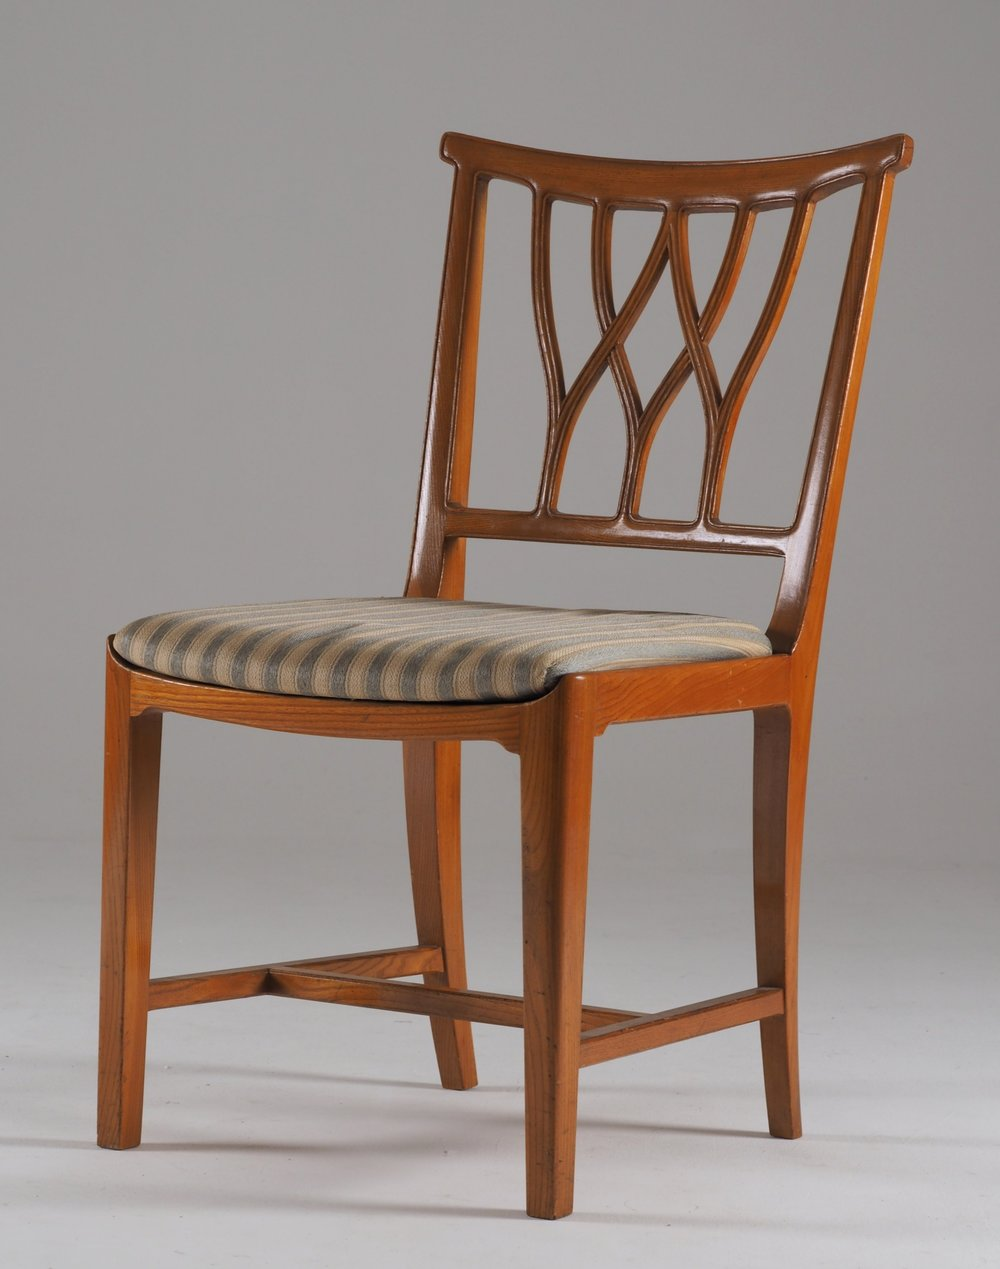 Runar Engblom 8 chairs 1940´s. & Runar Engblom 8 chairs 1940´s. u2014 Karlsson | Wickman